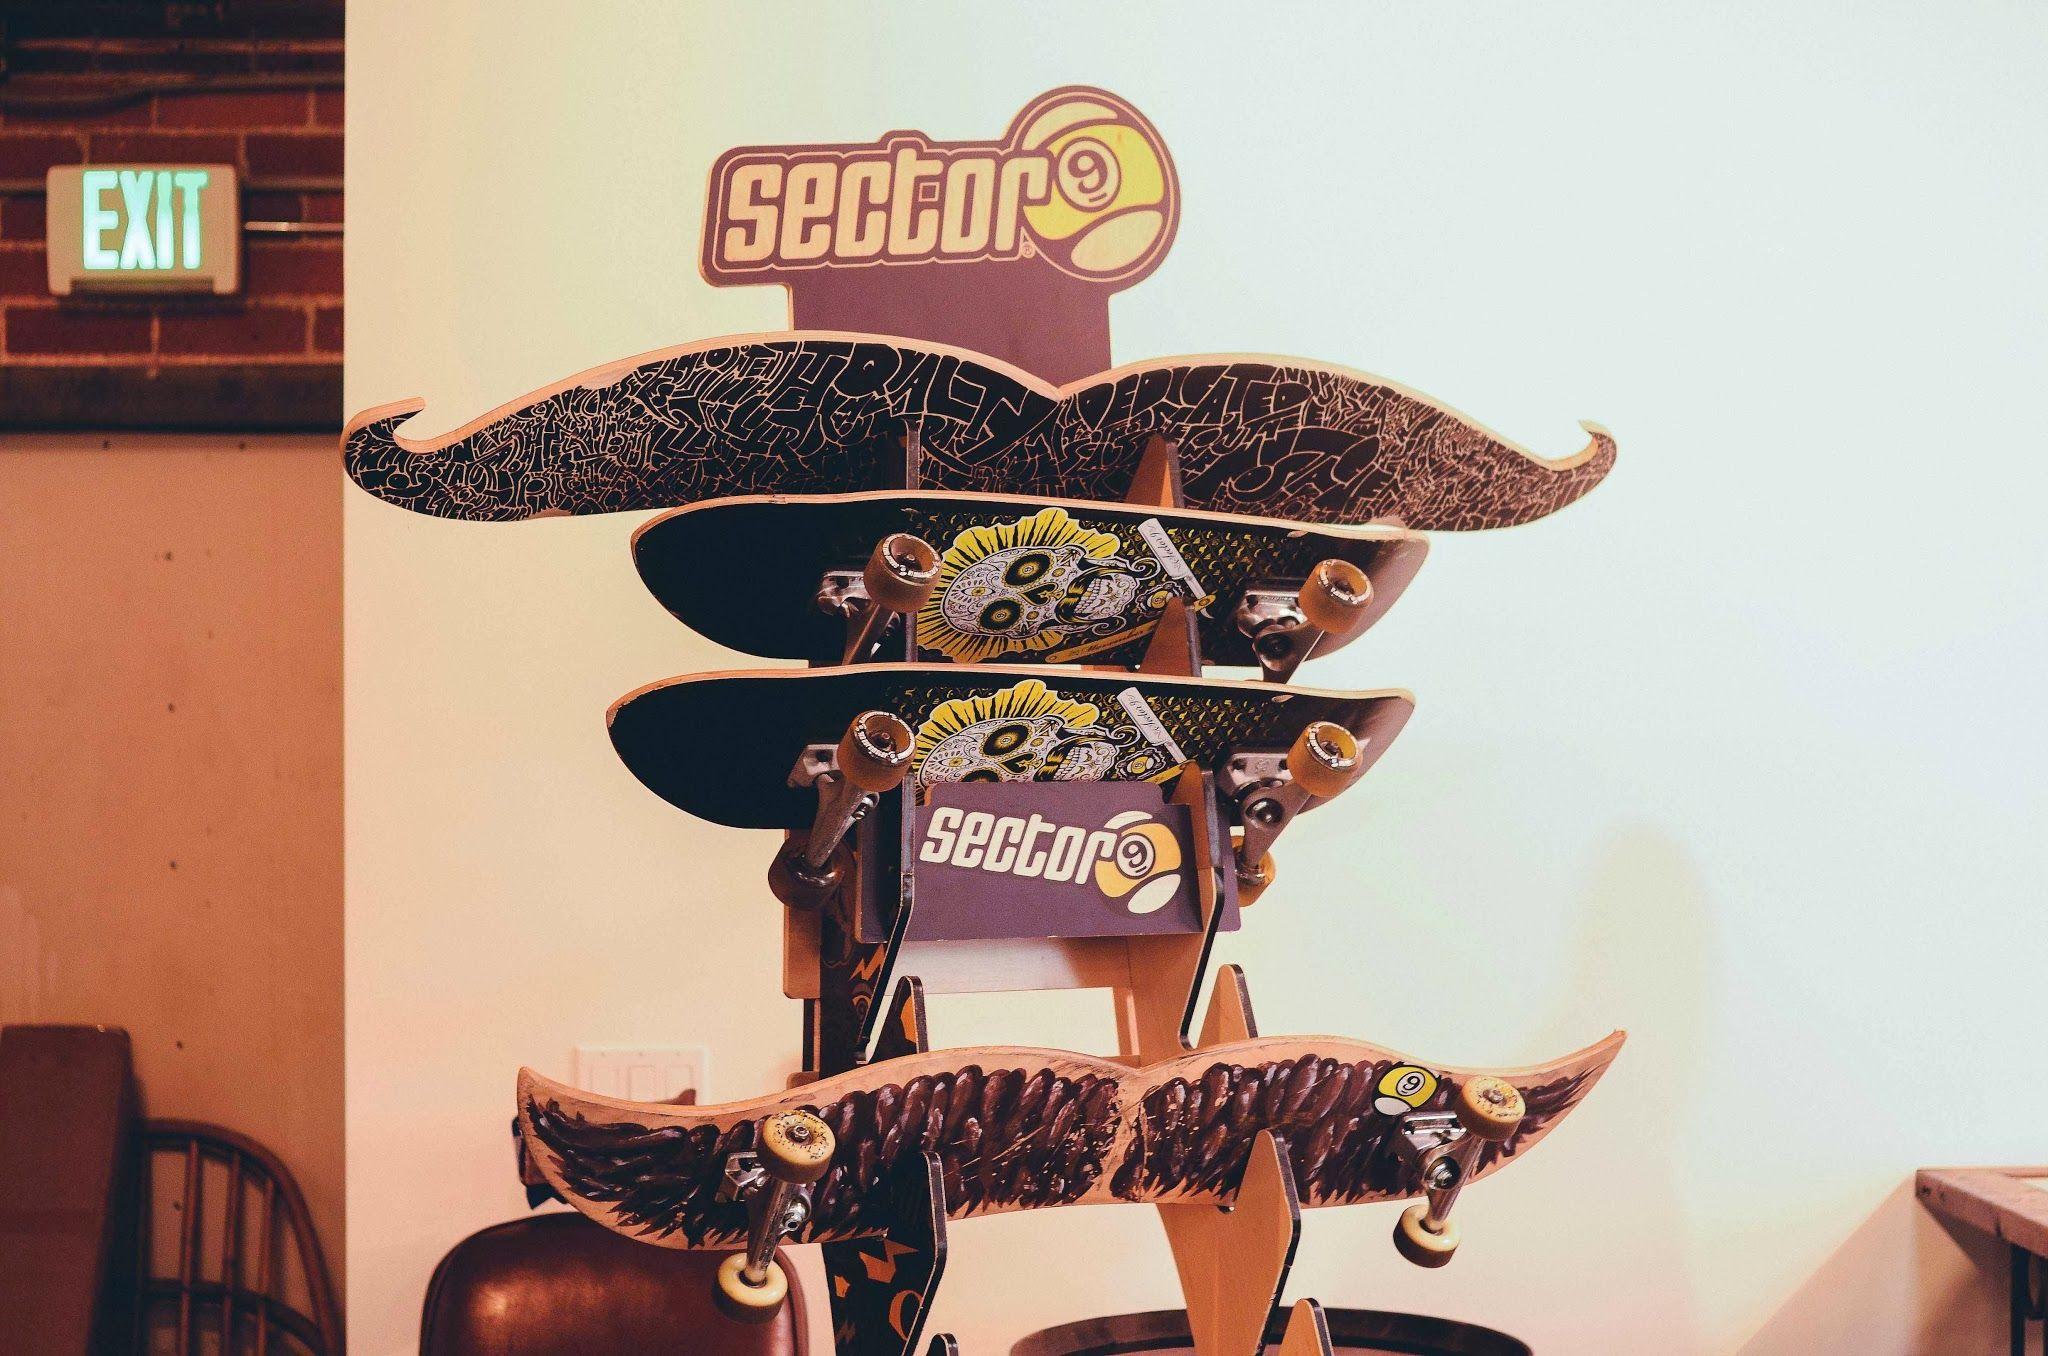 Mustache skateboards at the LA Movember headquarters. Photos were processed with VSCO. // www.cjjohnson.tv www.movember.com   #movember #mobro #Mustaches #portraits #culvercity #cjjohnson #michaelpowell #gq #vsco